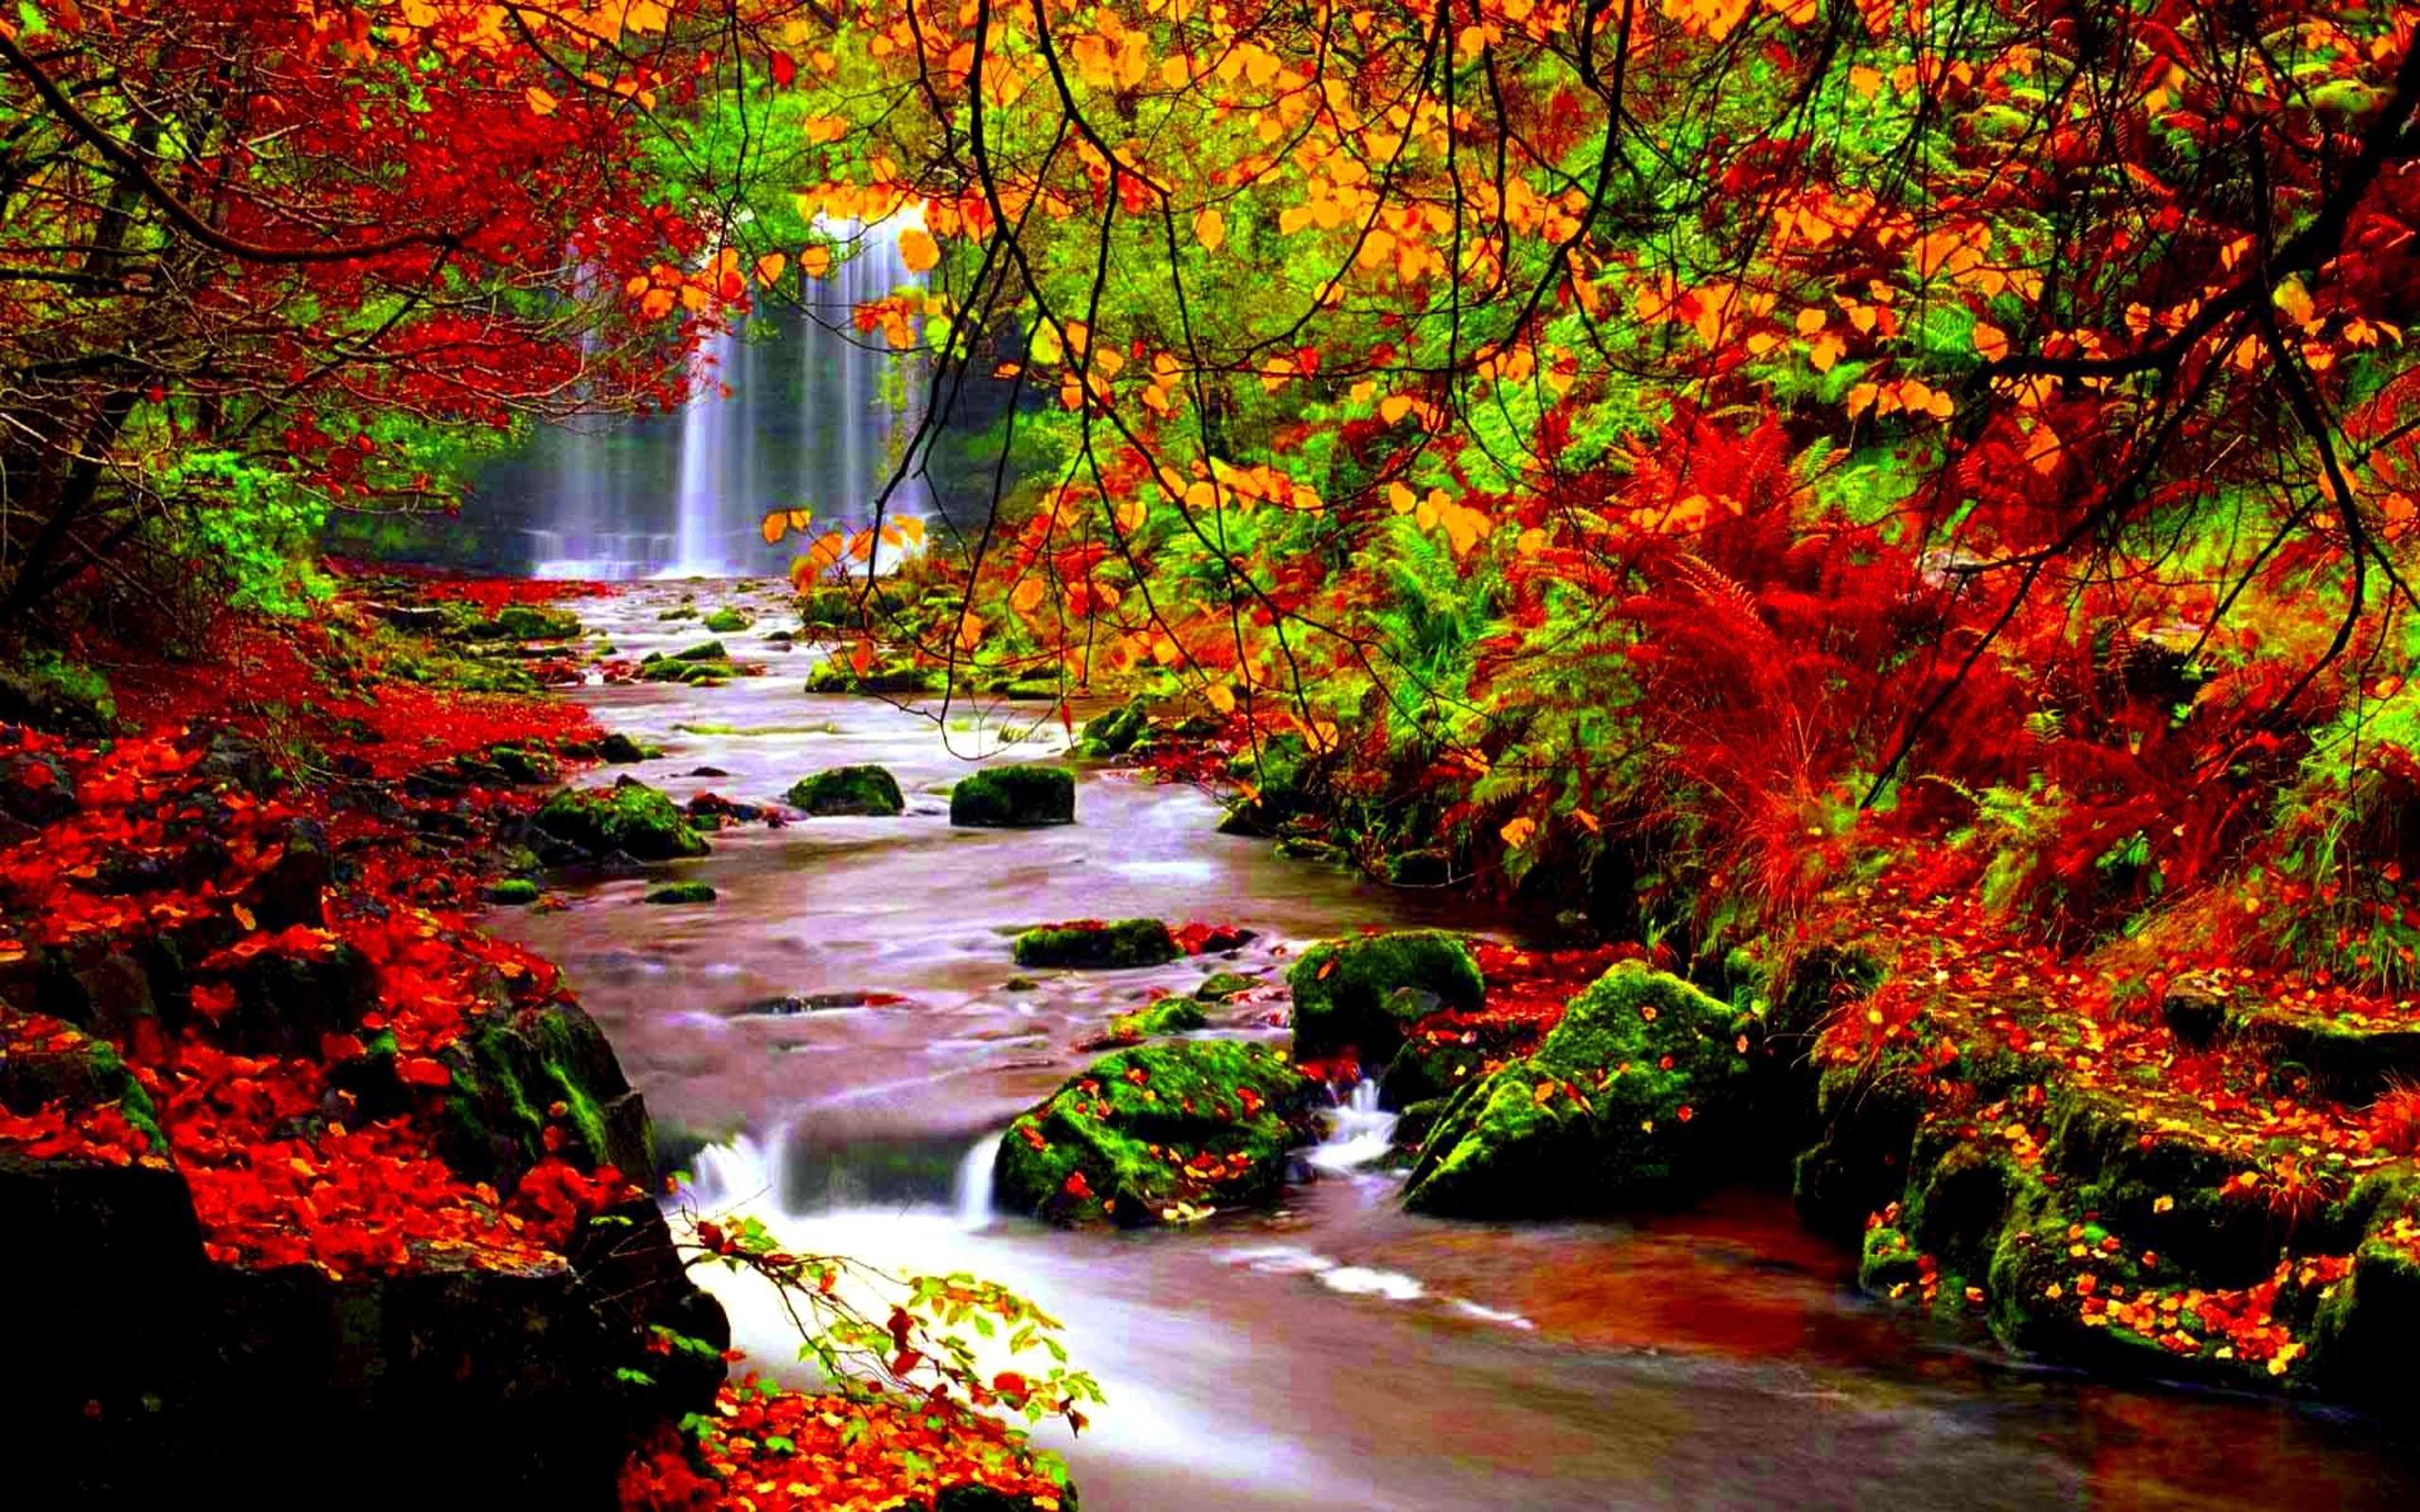 Rainy Season Wallpapers With Quotes Hd Autumn River Hd Wallpaper Pixelstalk Net